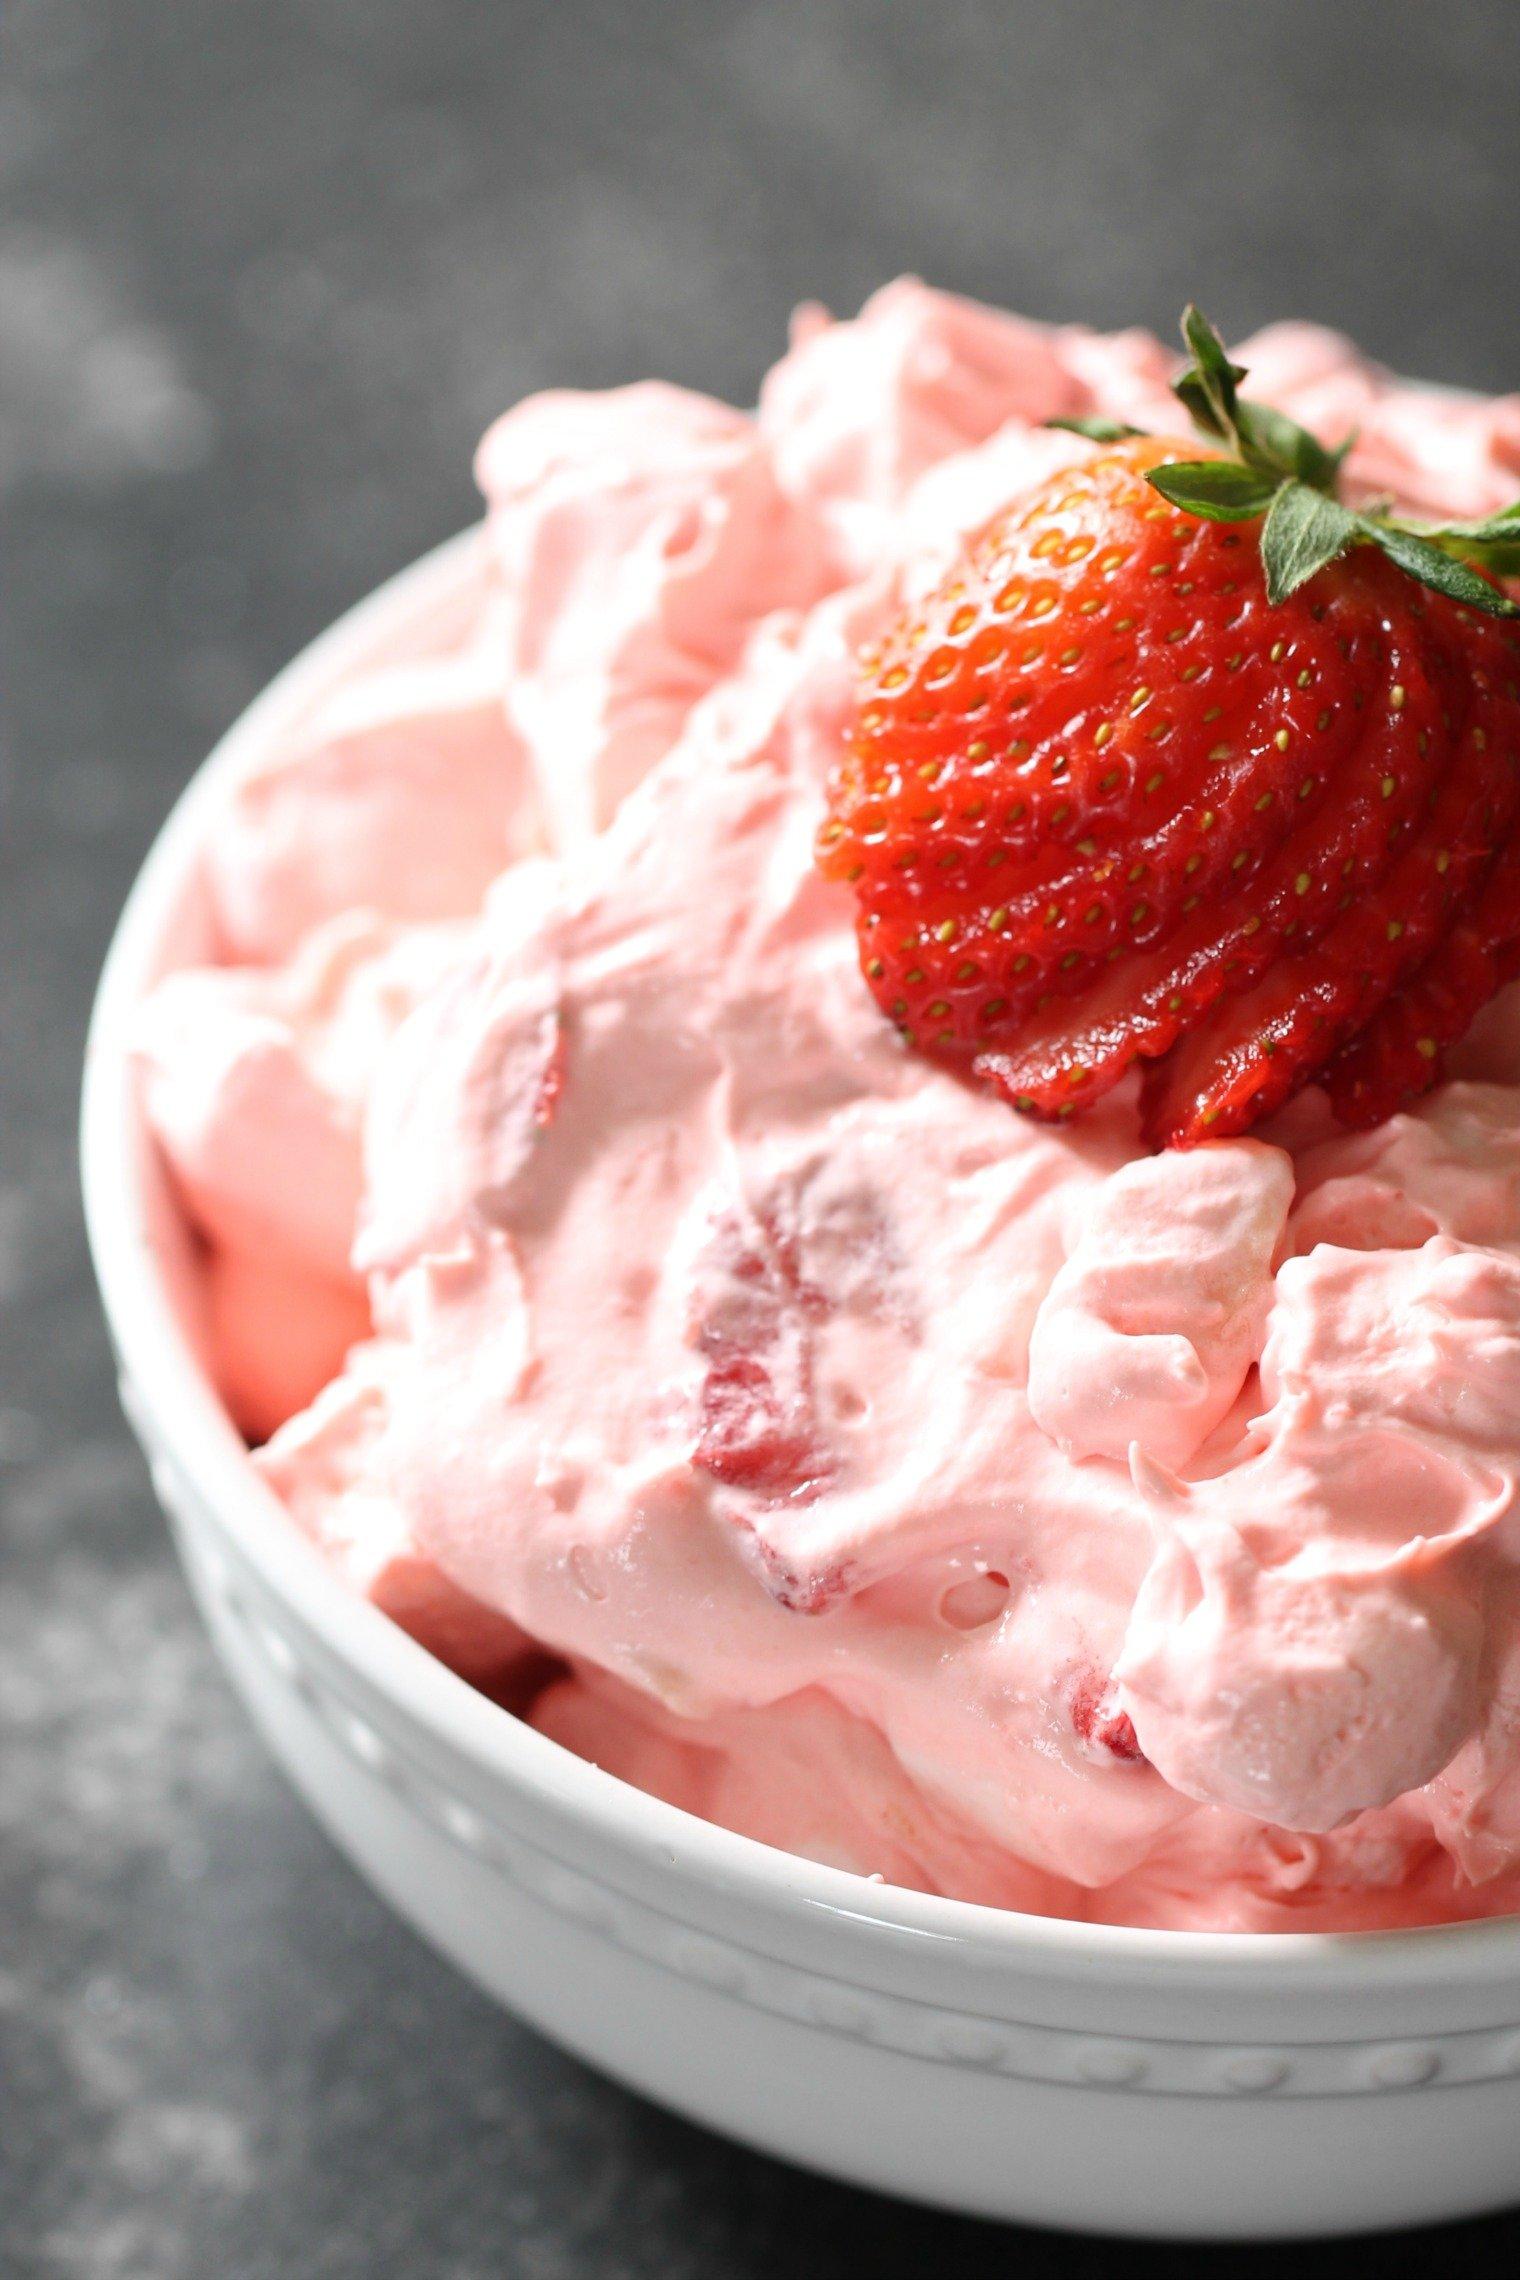 Strawberry Jello Cool Whip Fluff